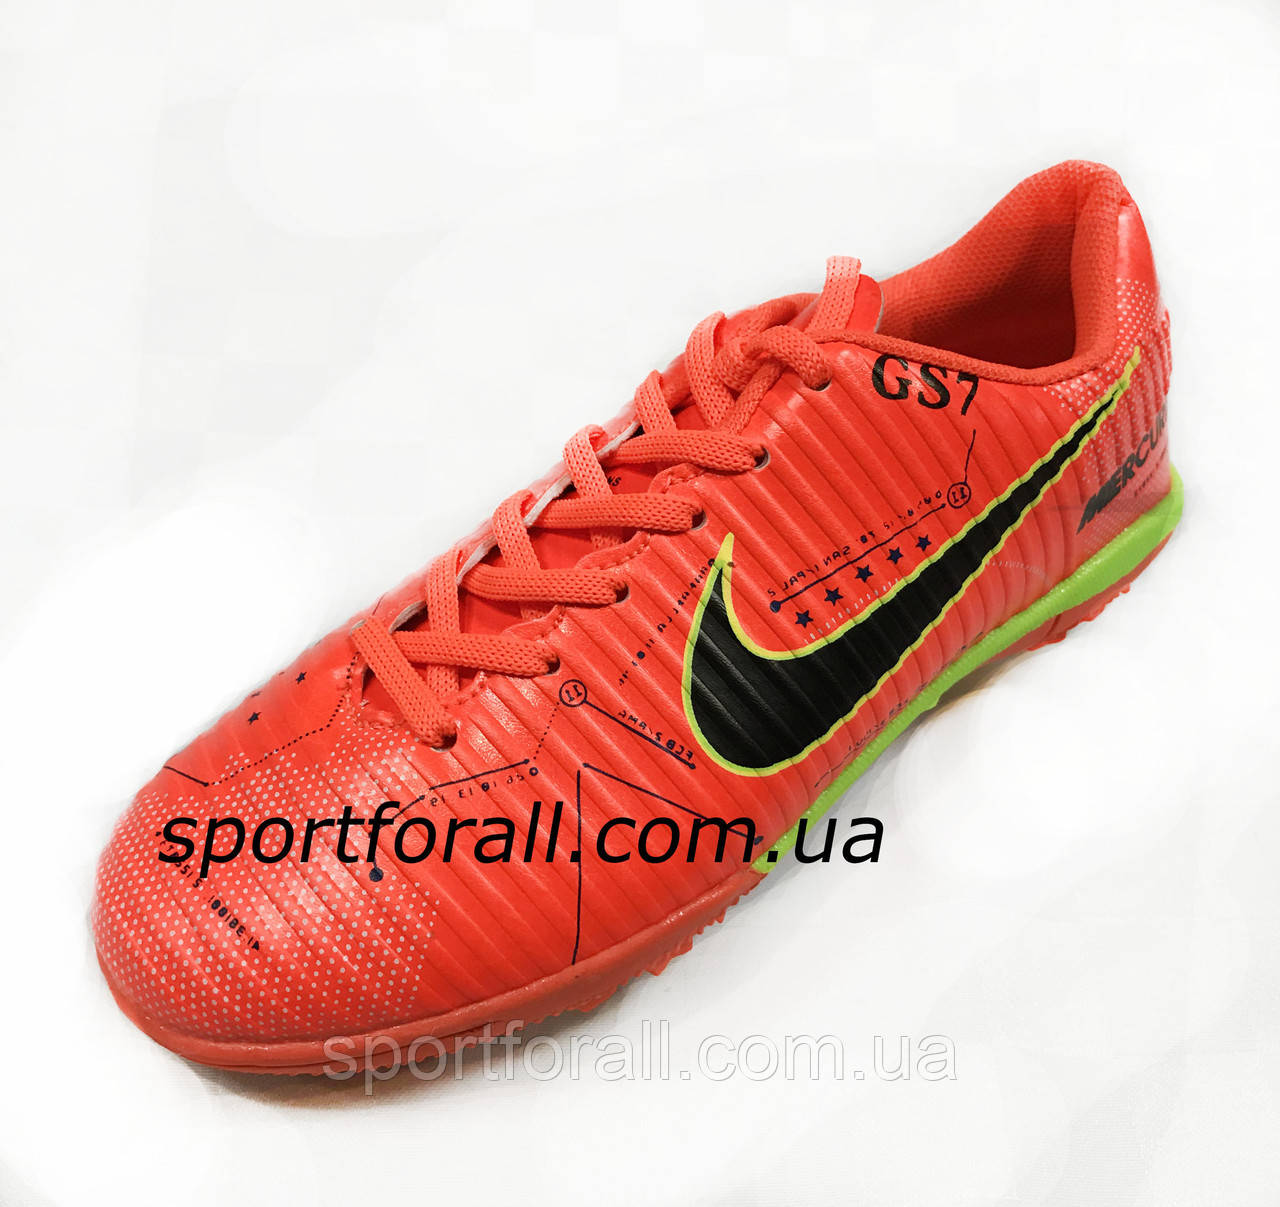 Сороконожки Nike MERCURIAL X GS7 Р 31оранжевые( РАСПРОДАЖА)